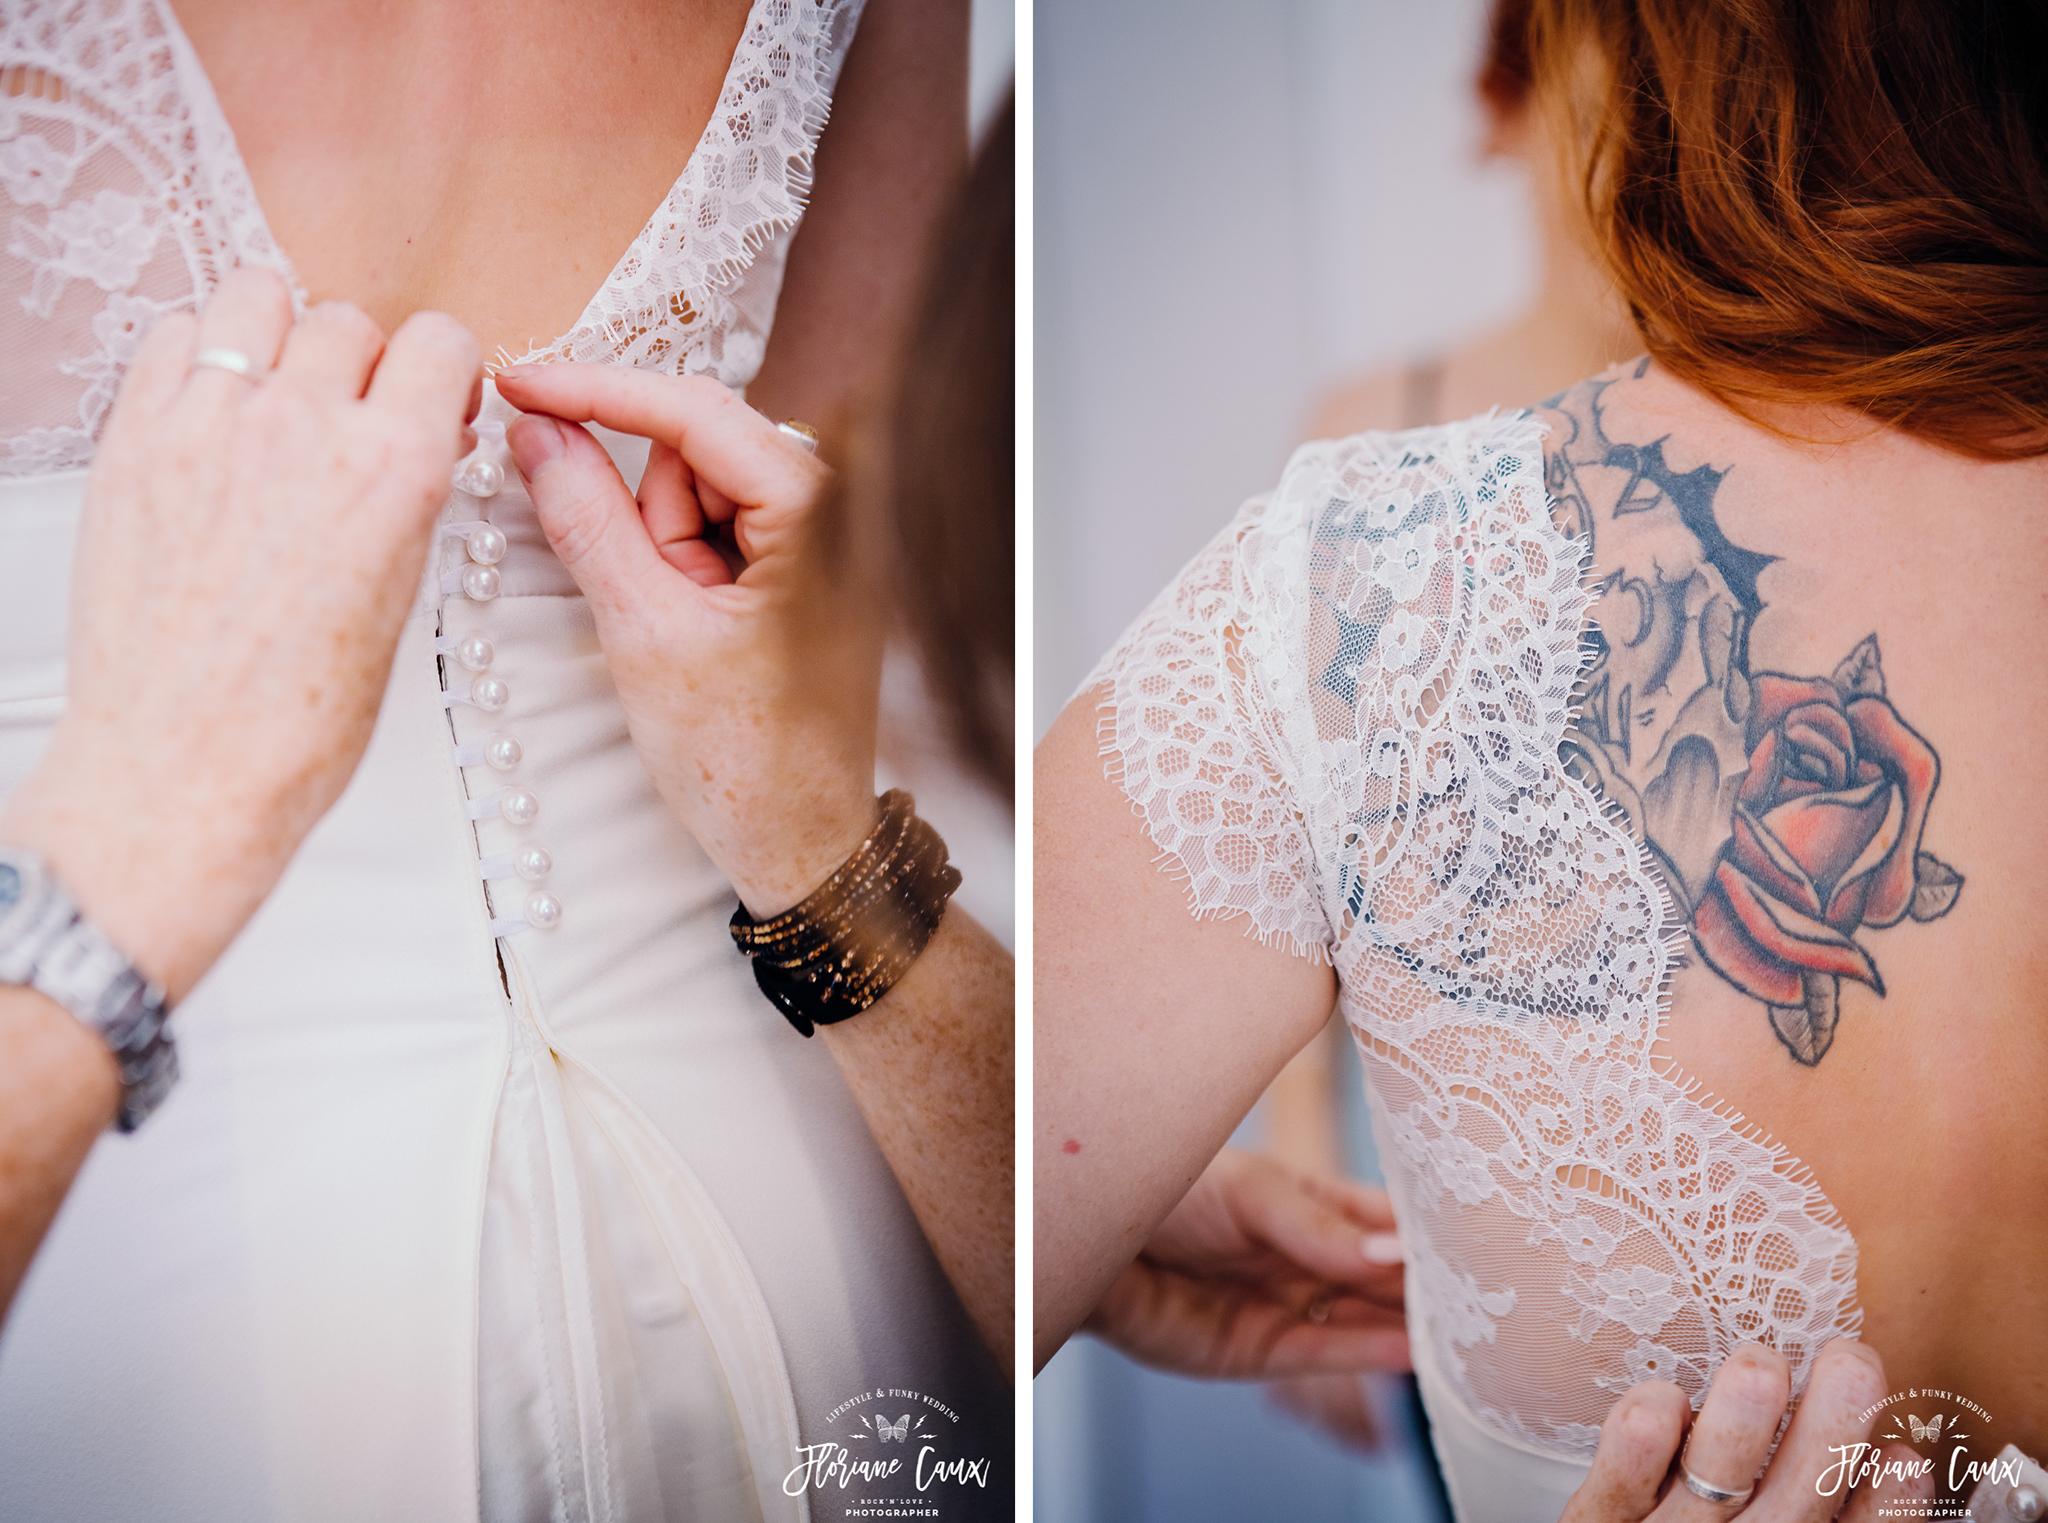 photographe-mariage-toulouse-rocknroll-maries-tatoues-floriane-caux-10